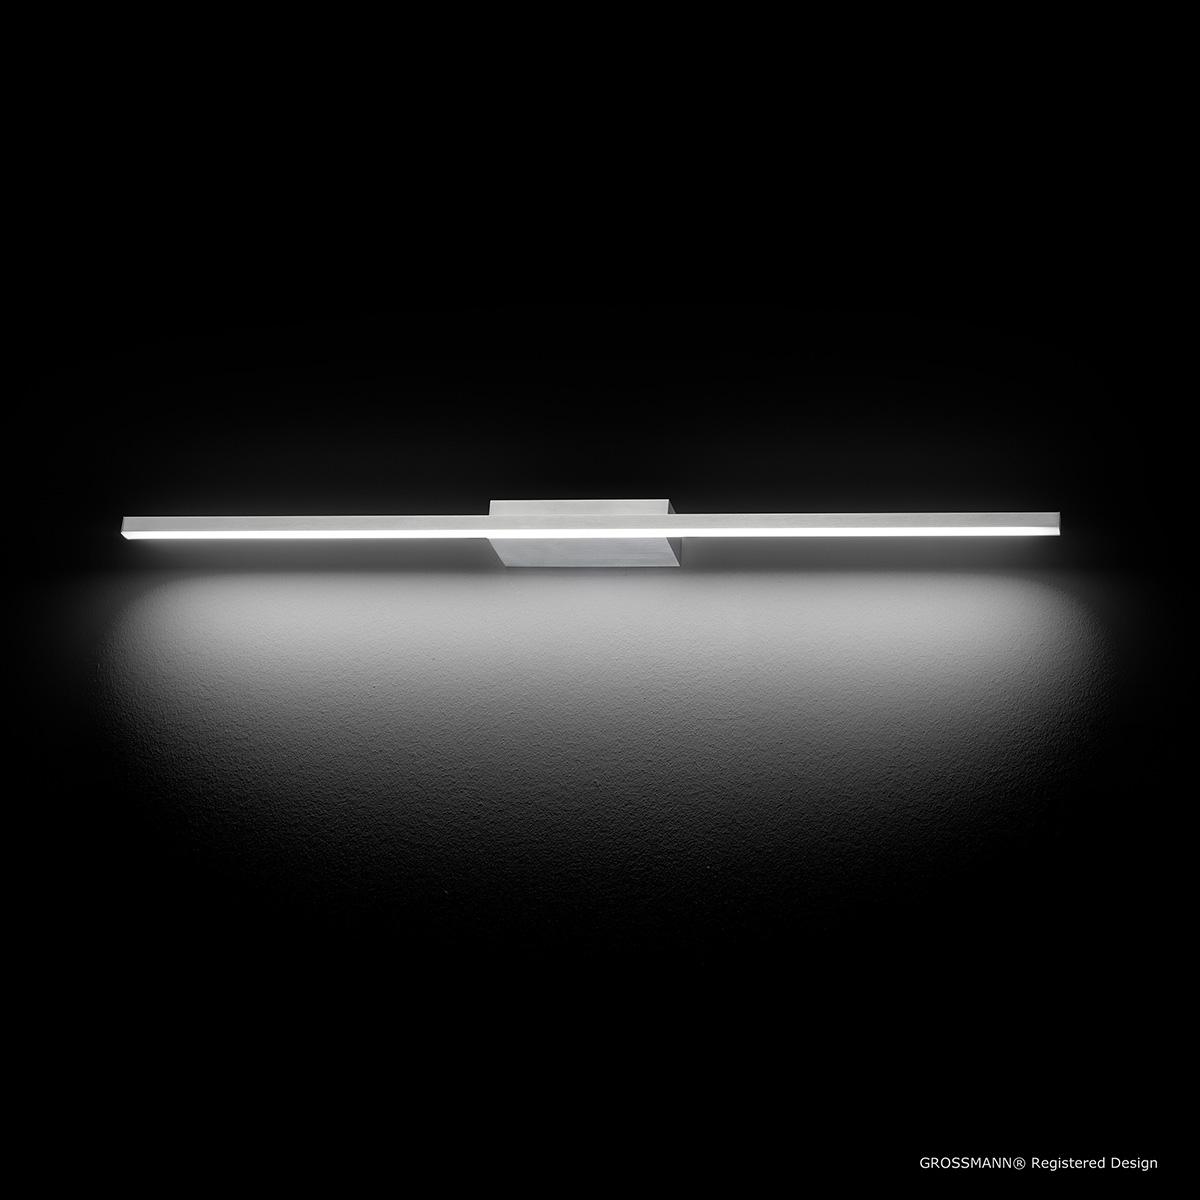 Grossmann Forte LED Wandleuchte 54-763-072